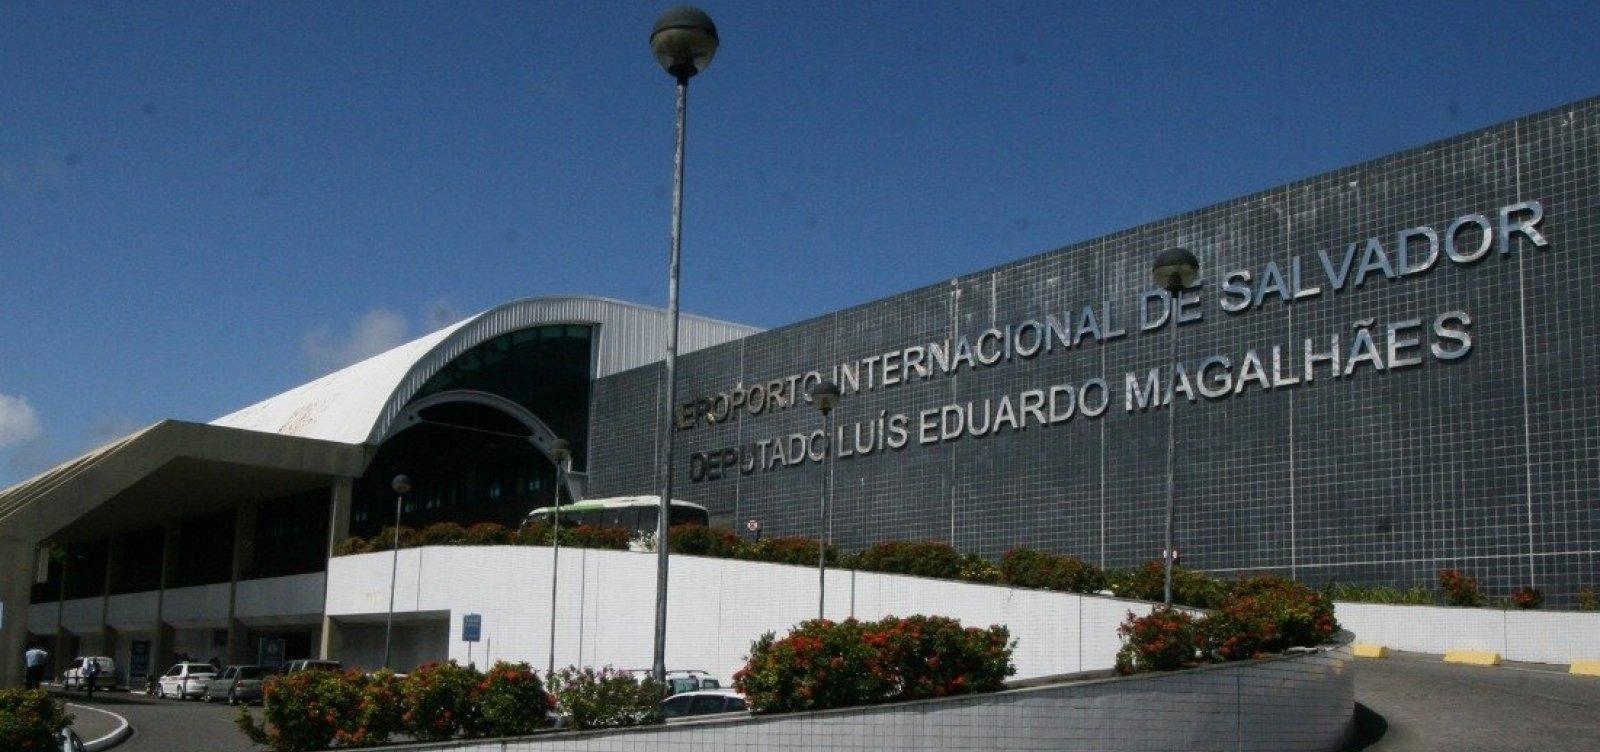 [Pista principal do aeroporto de Salvador volta a ser fechada]